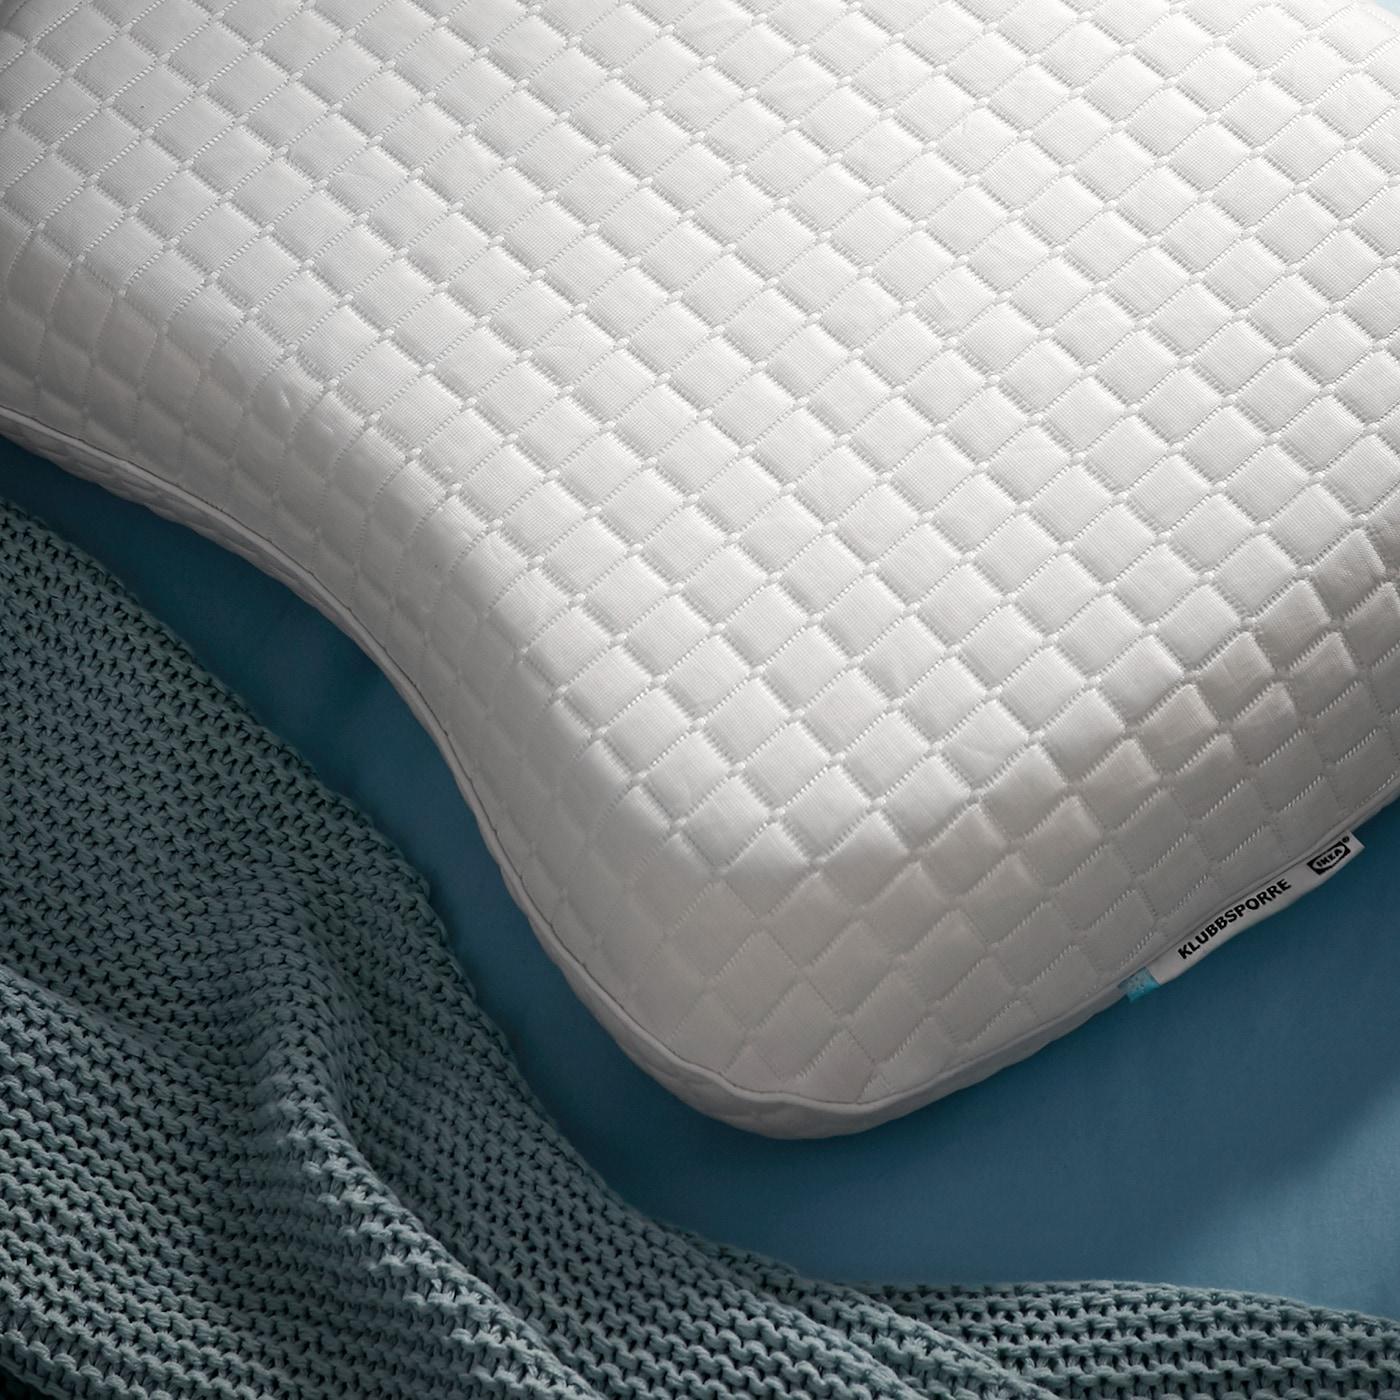 KLUBBSPORRE, Ergonomic pillow, multi